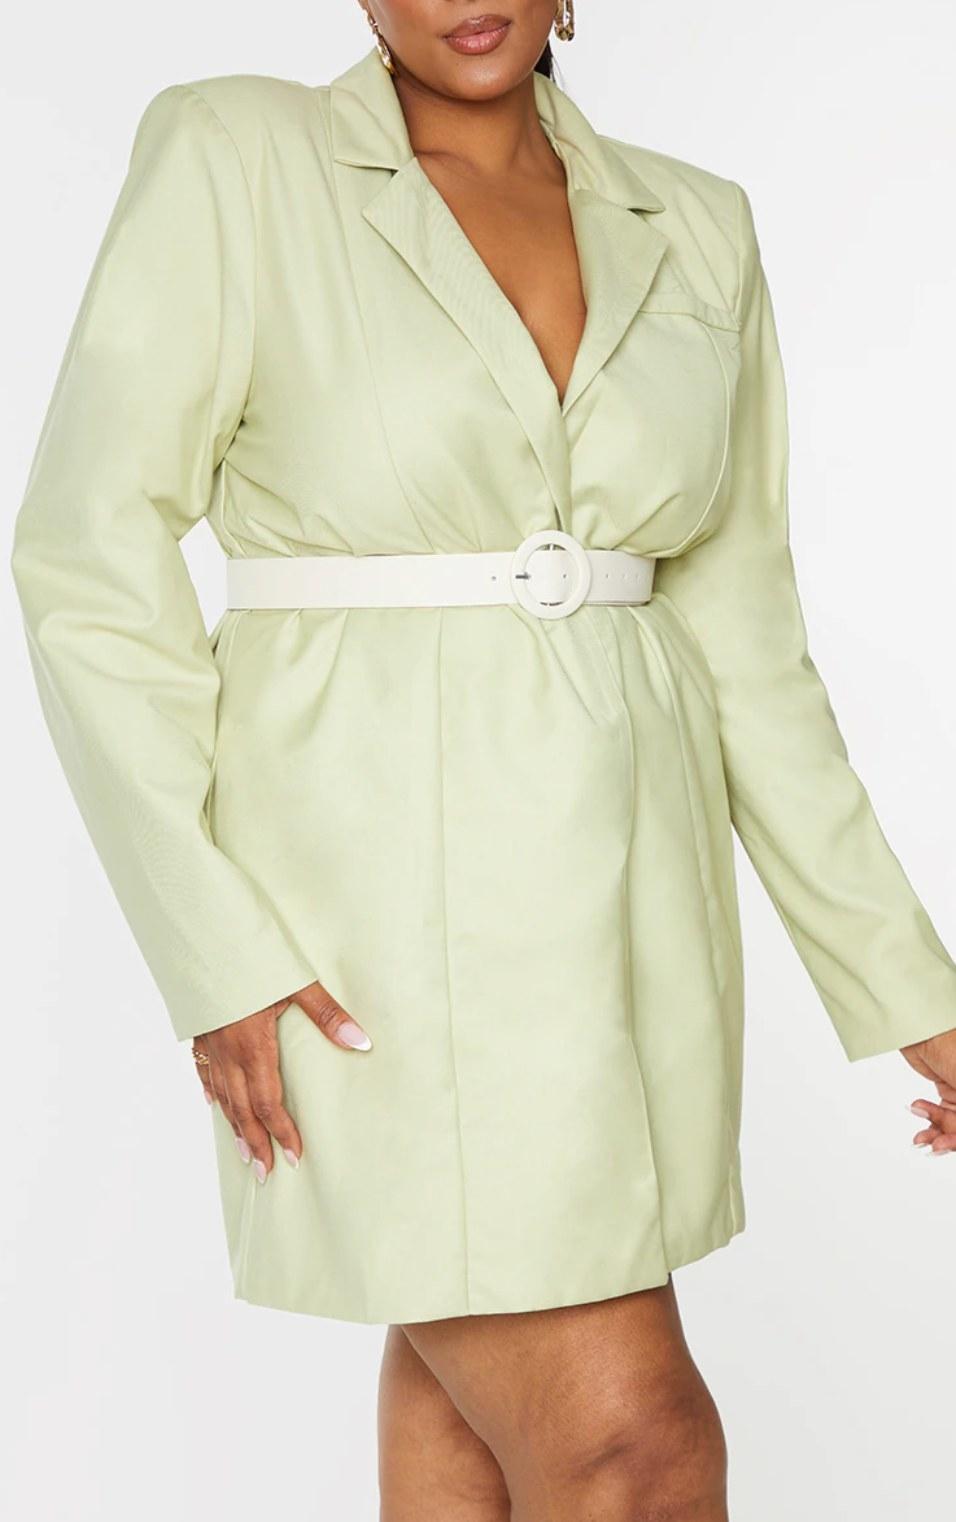 model wearing the white circle belt over a light green blazer dress